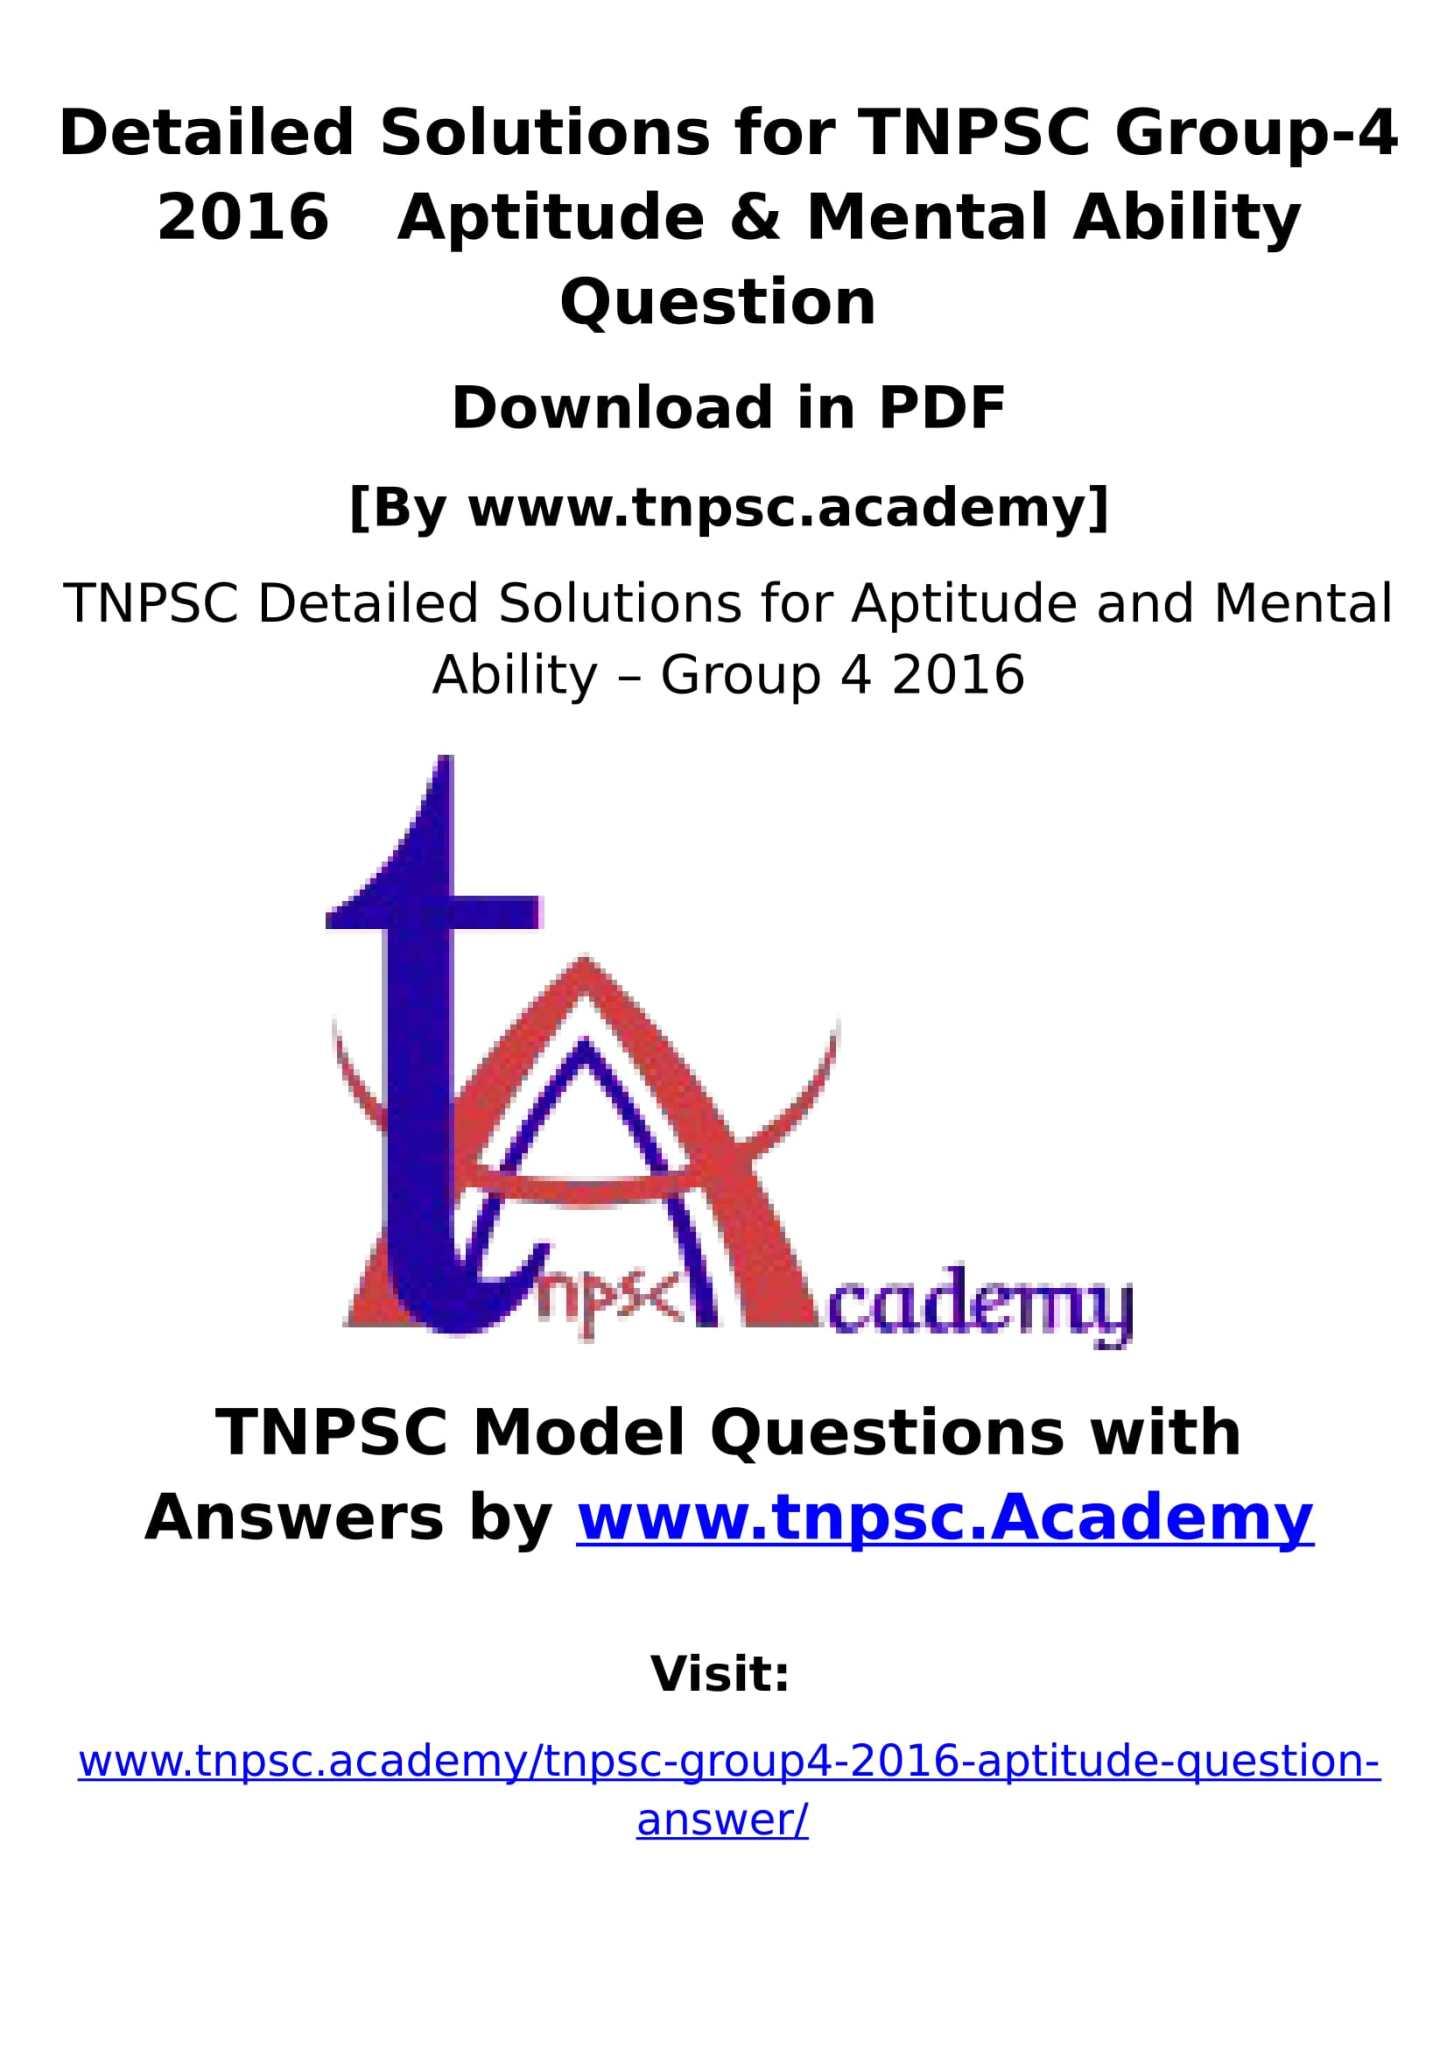 TNPSC Group 4 2016 Apps